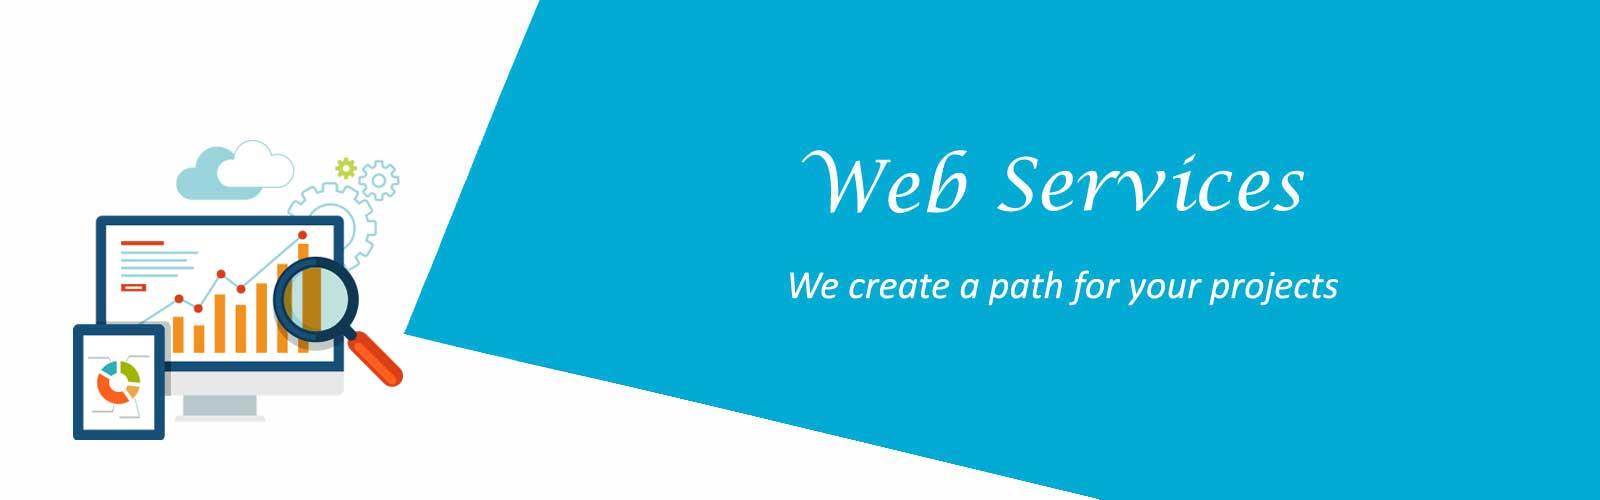 Winways System Private Ltd